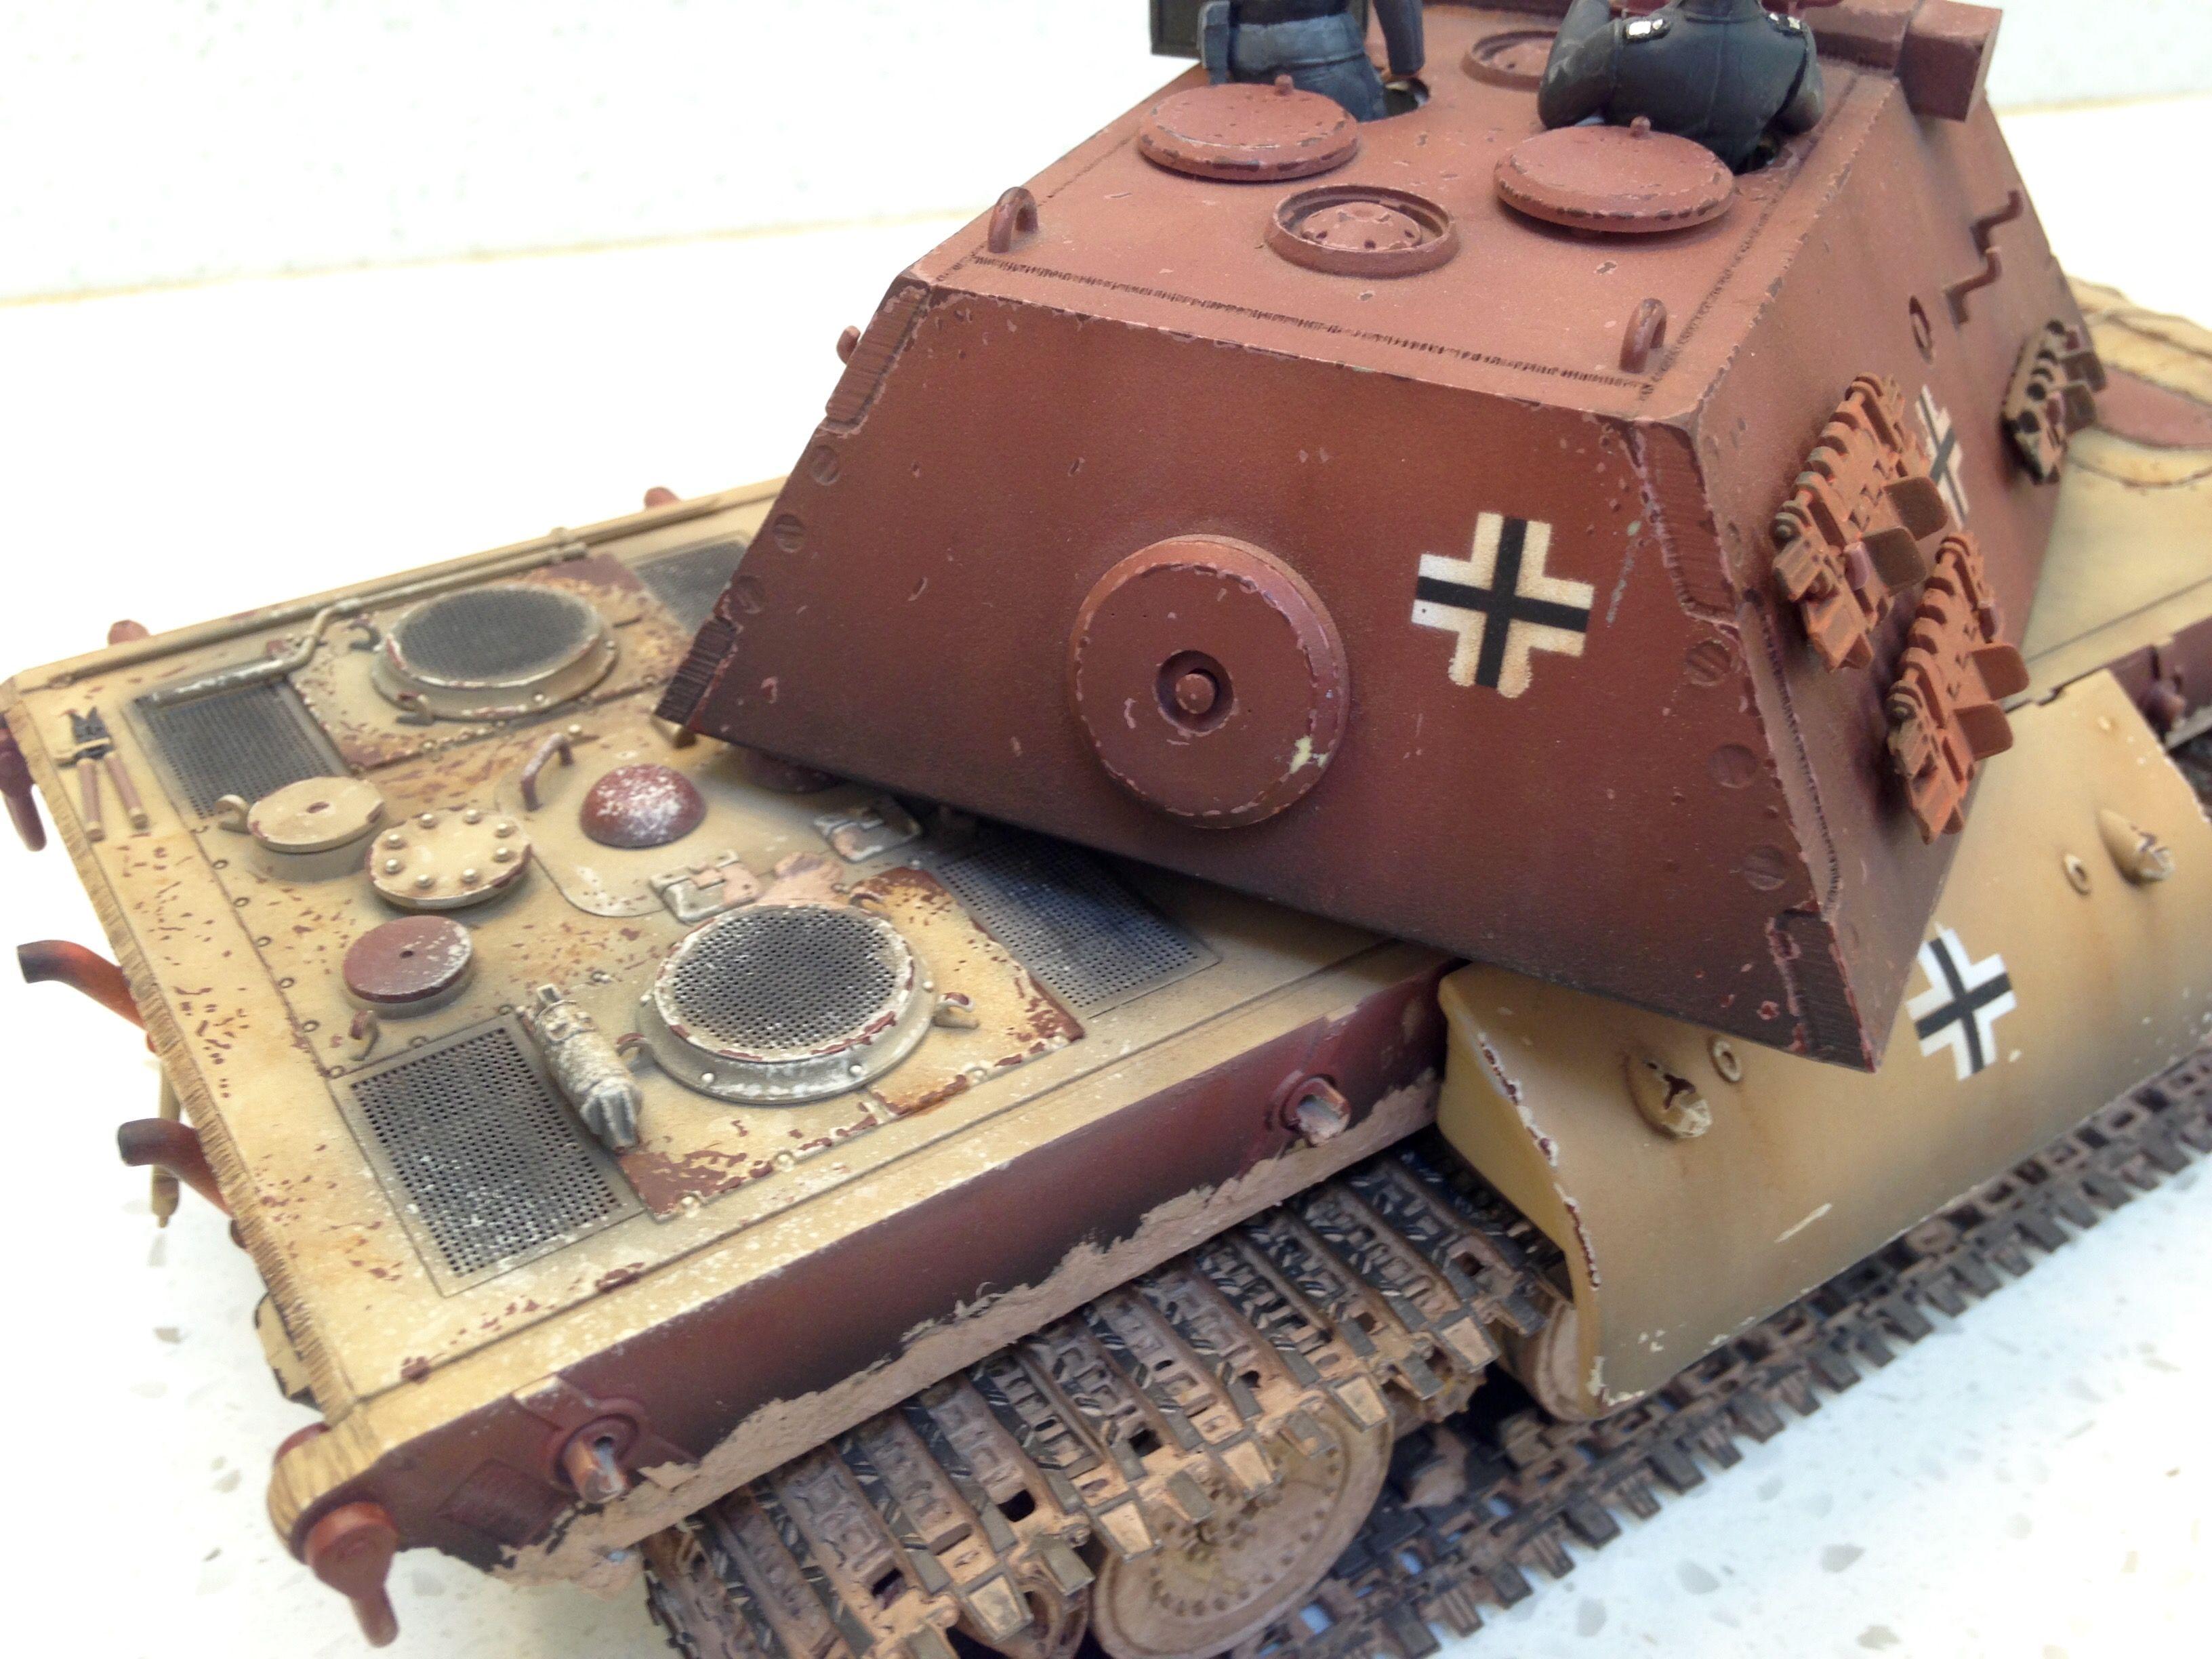 built 135 world of tanks tier 10 german e100 heavy tank with pak 15cm metal gun